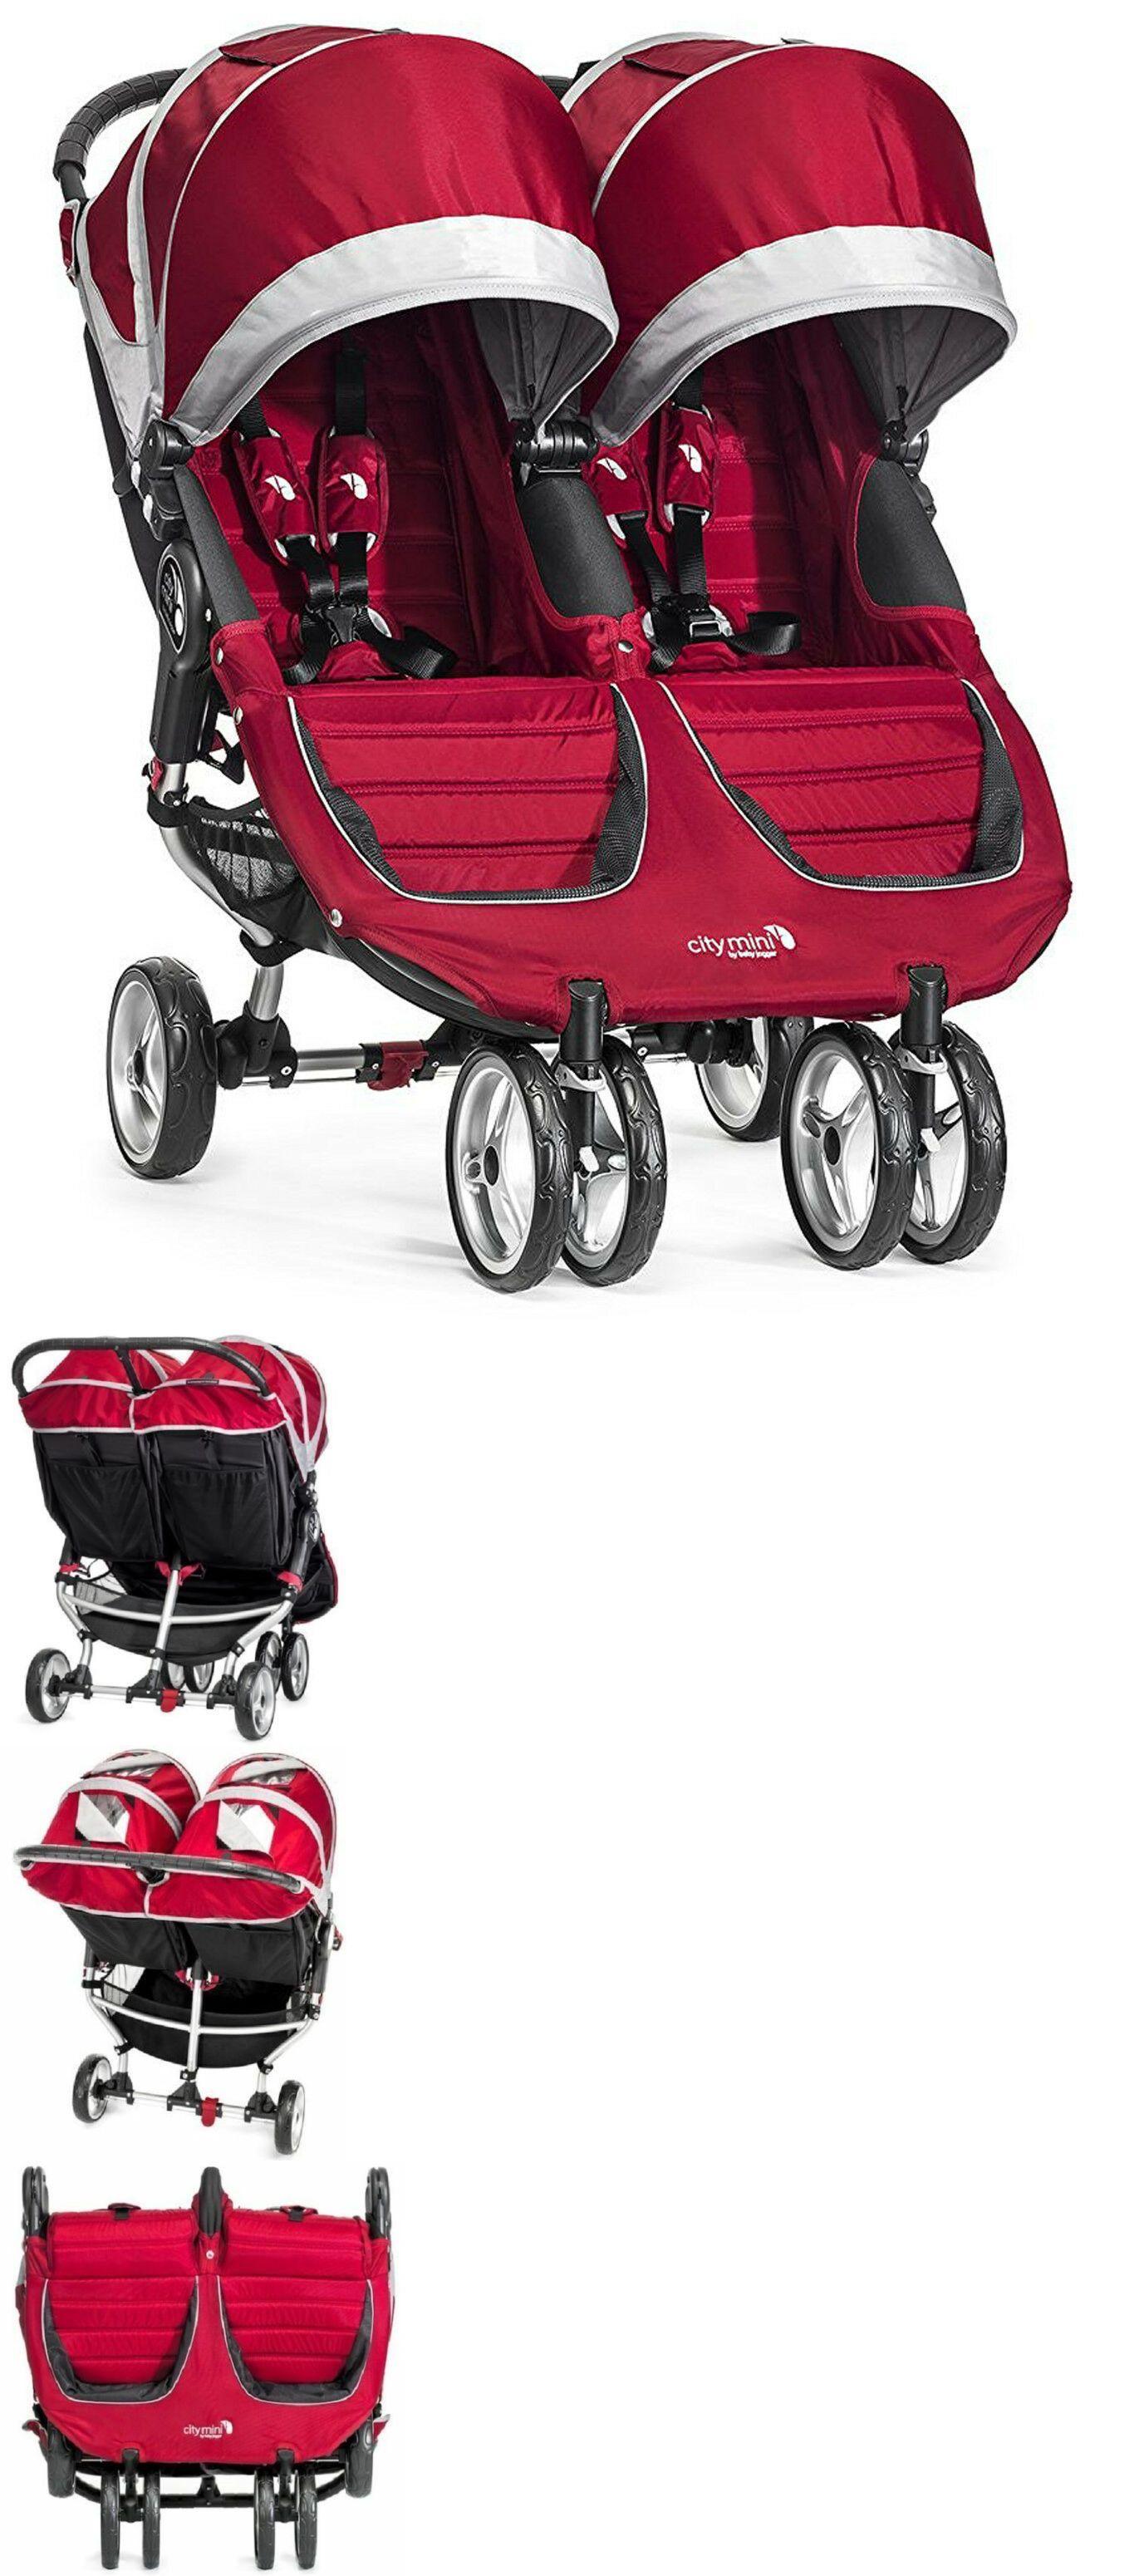 19+ City stroller mini double info